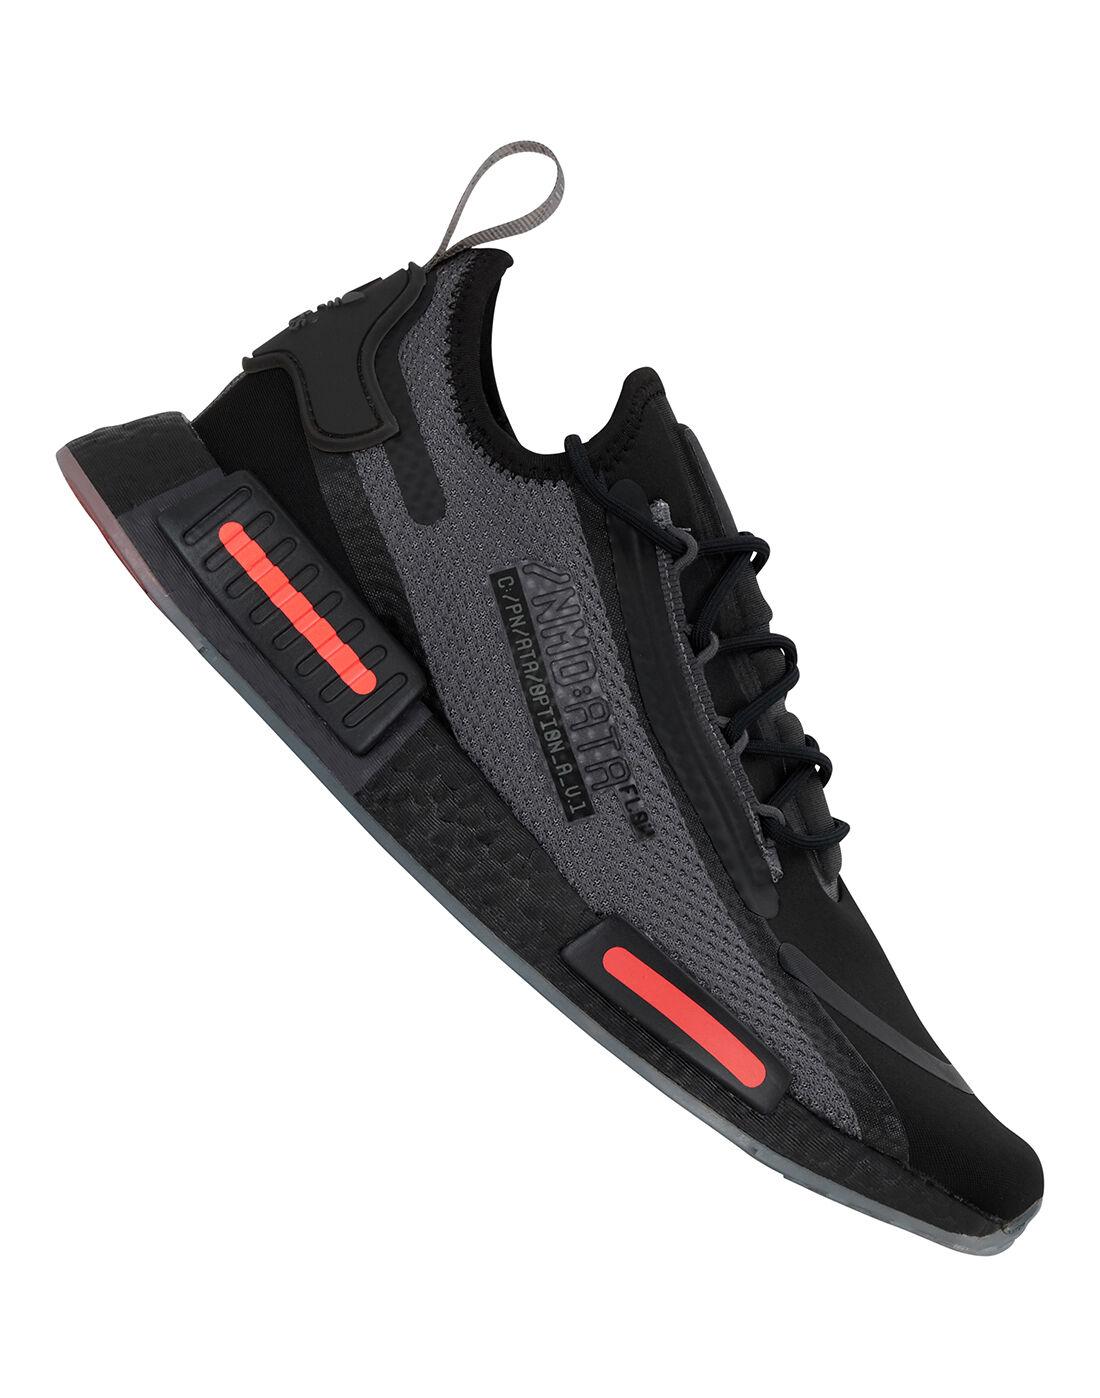 adidas Originals Mens NMD R1 Spectoo - Black | adidas cheer ...